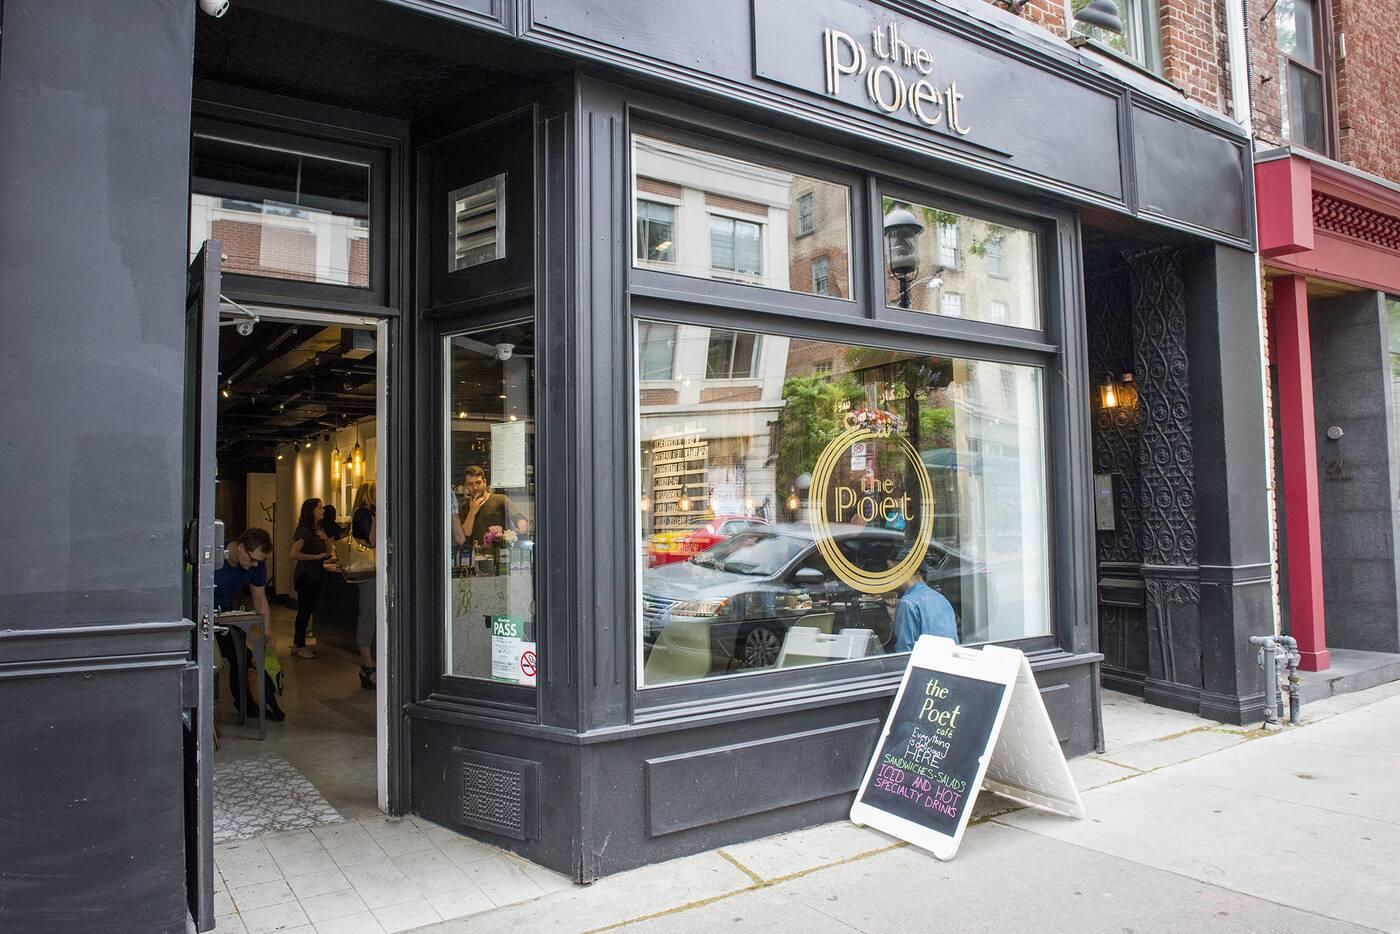 Poet Cafe Toronto